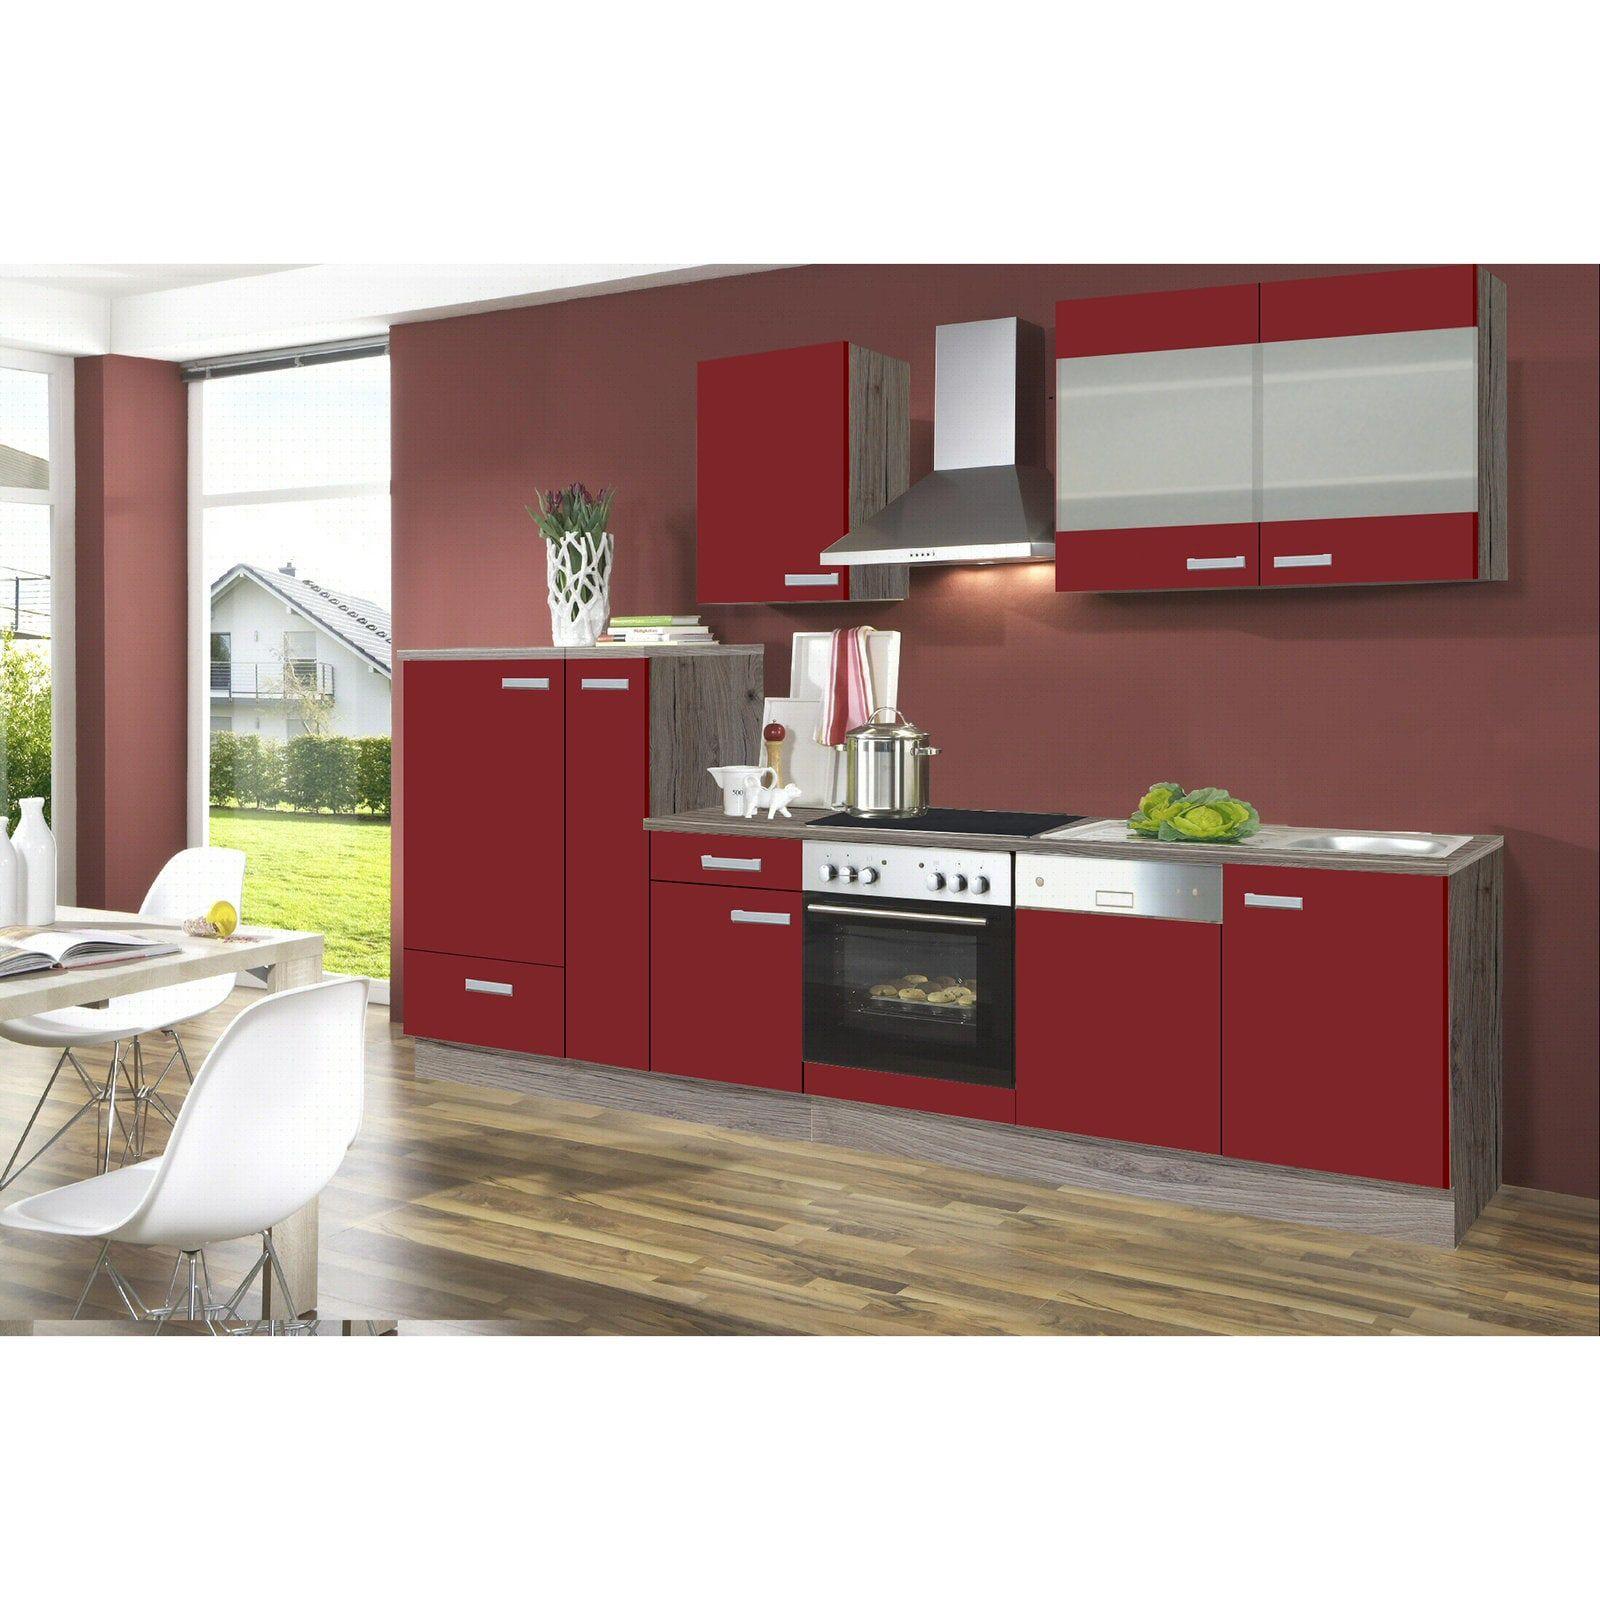 Super Küchenblock RONJA - rot-Sonoma Trüffel - 300 cm ohne E-Geräte KN13